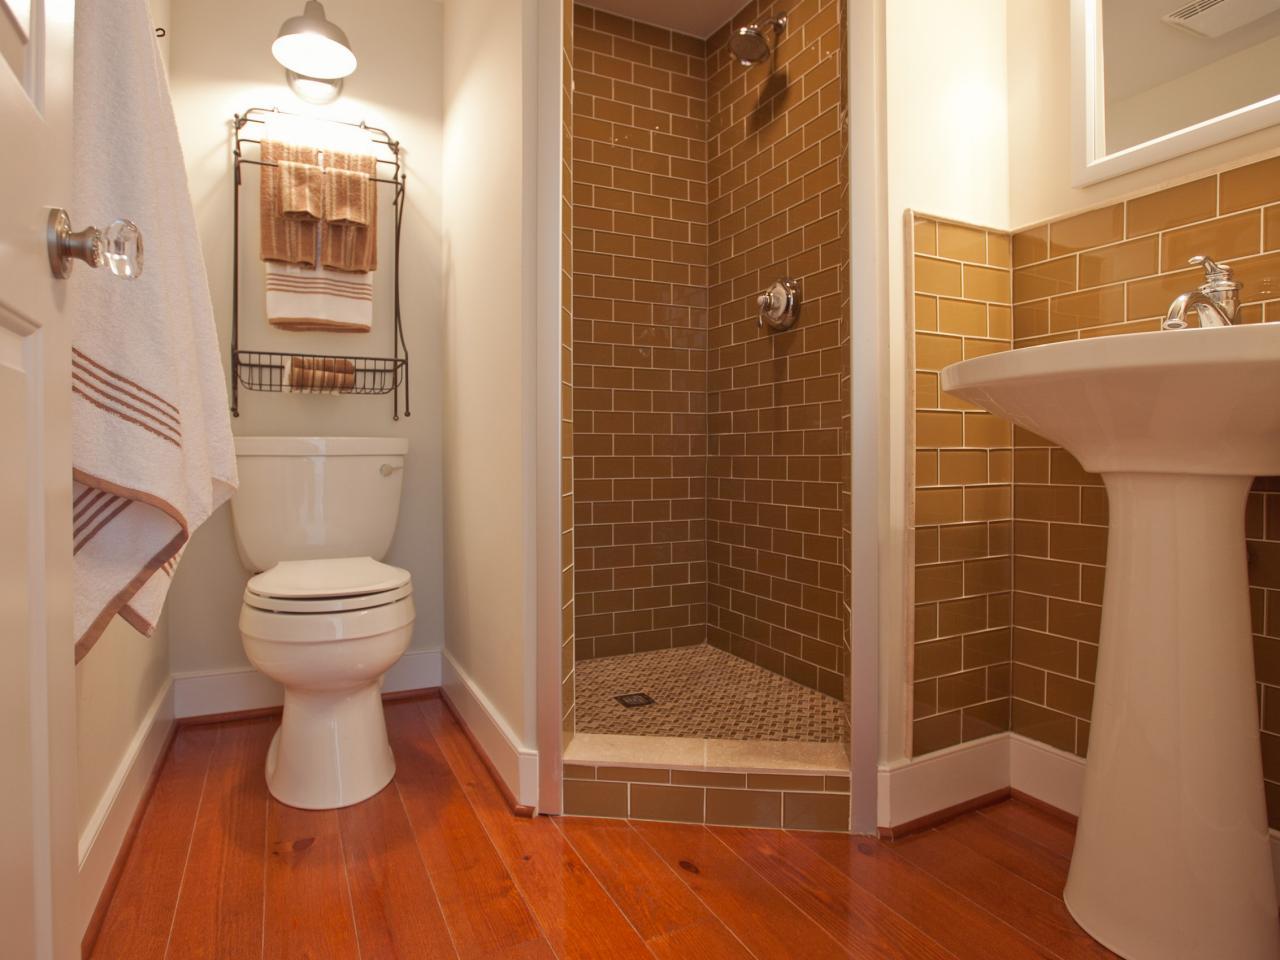 BC11_01-Guest-Bathroom-FM-9968_s4x3.jpg.rend.hgtvcom.1280.960